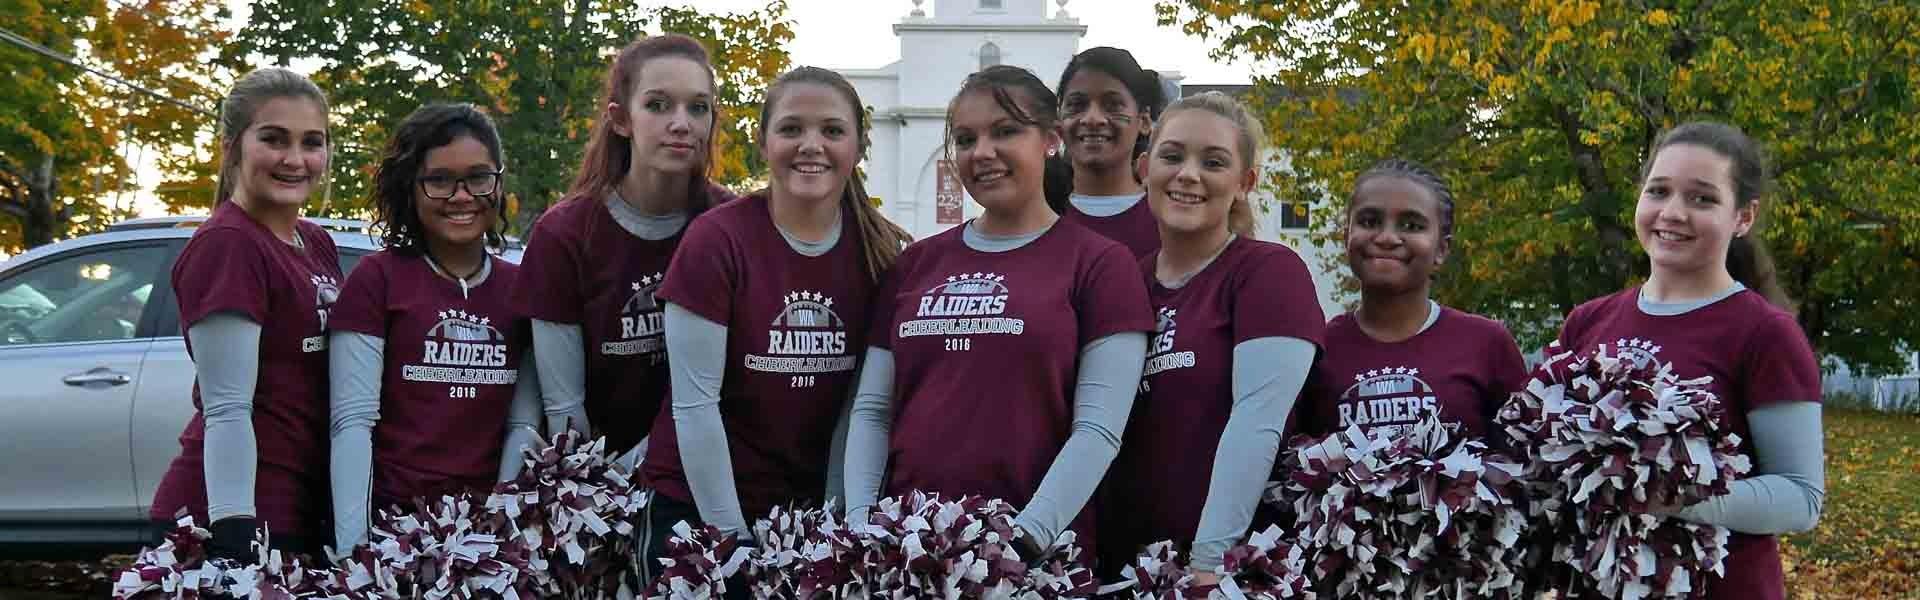 Washington Academy Maine USA Cheerleaders Banner 2019